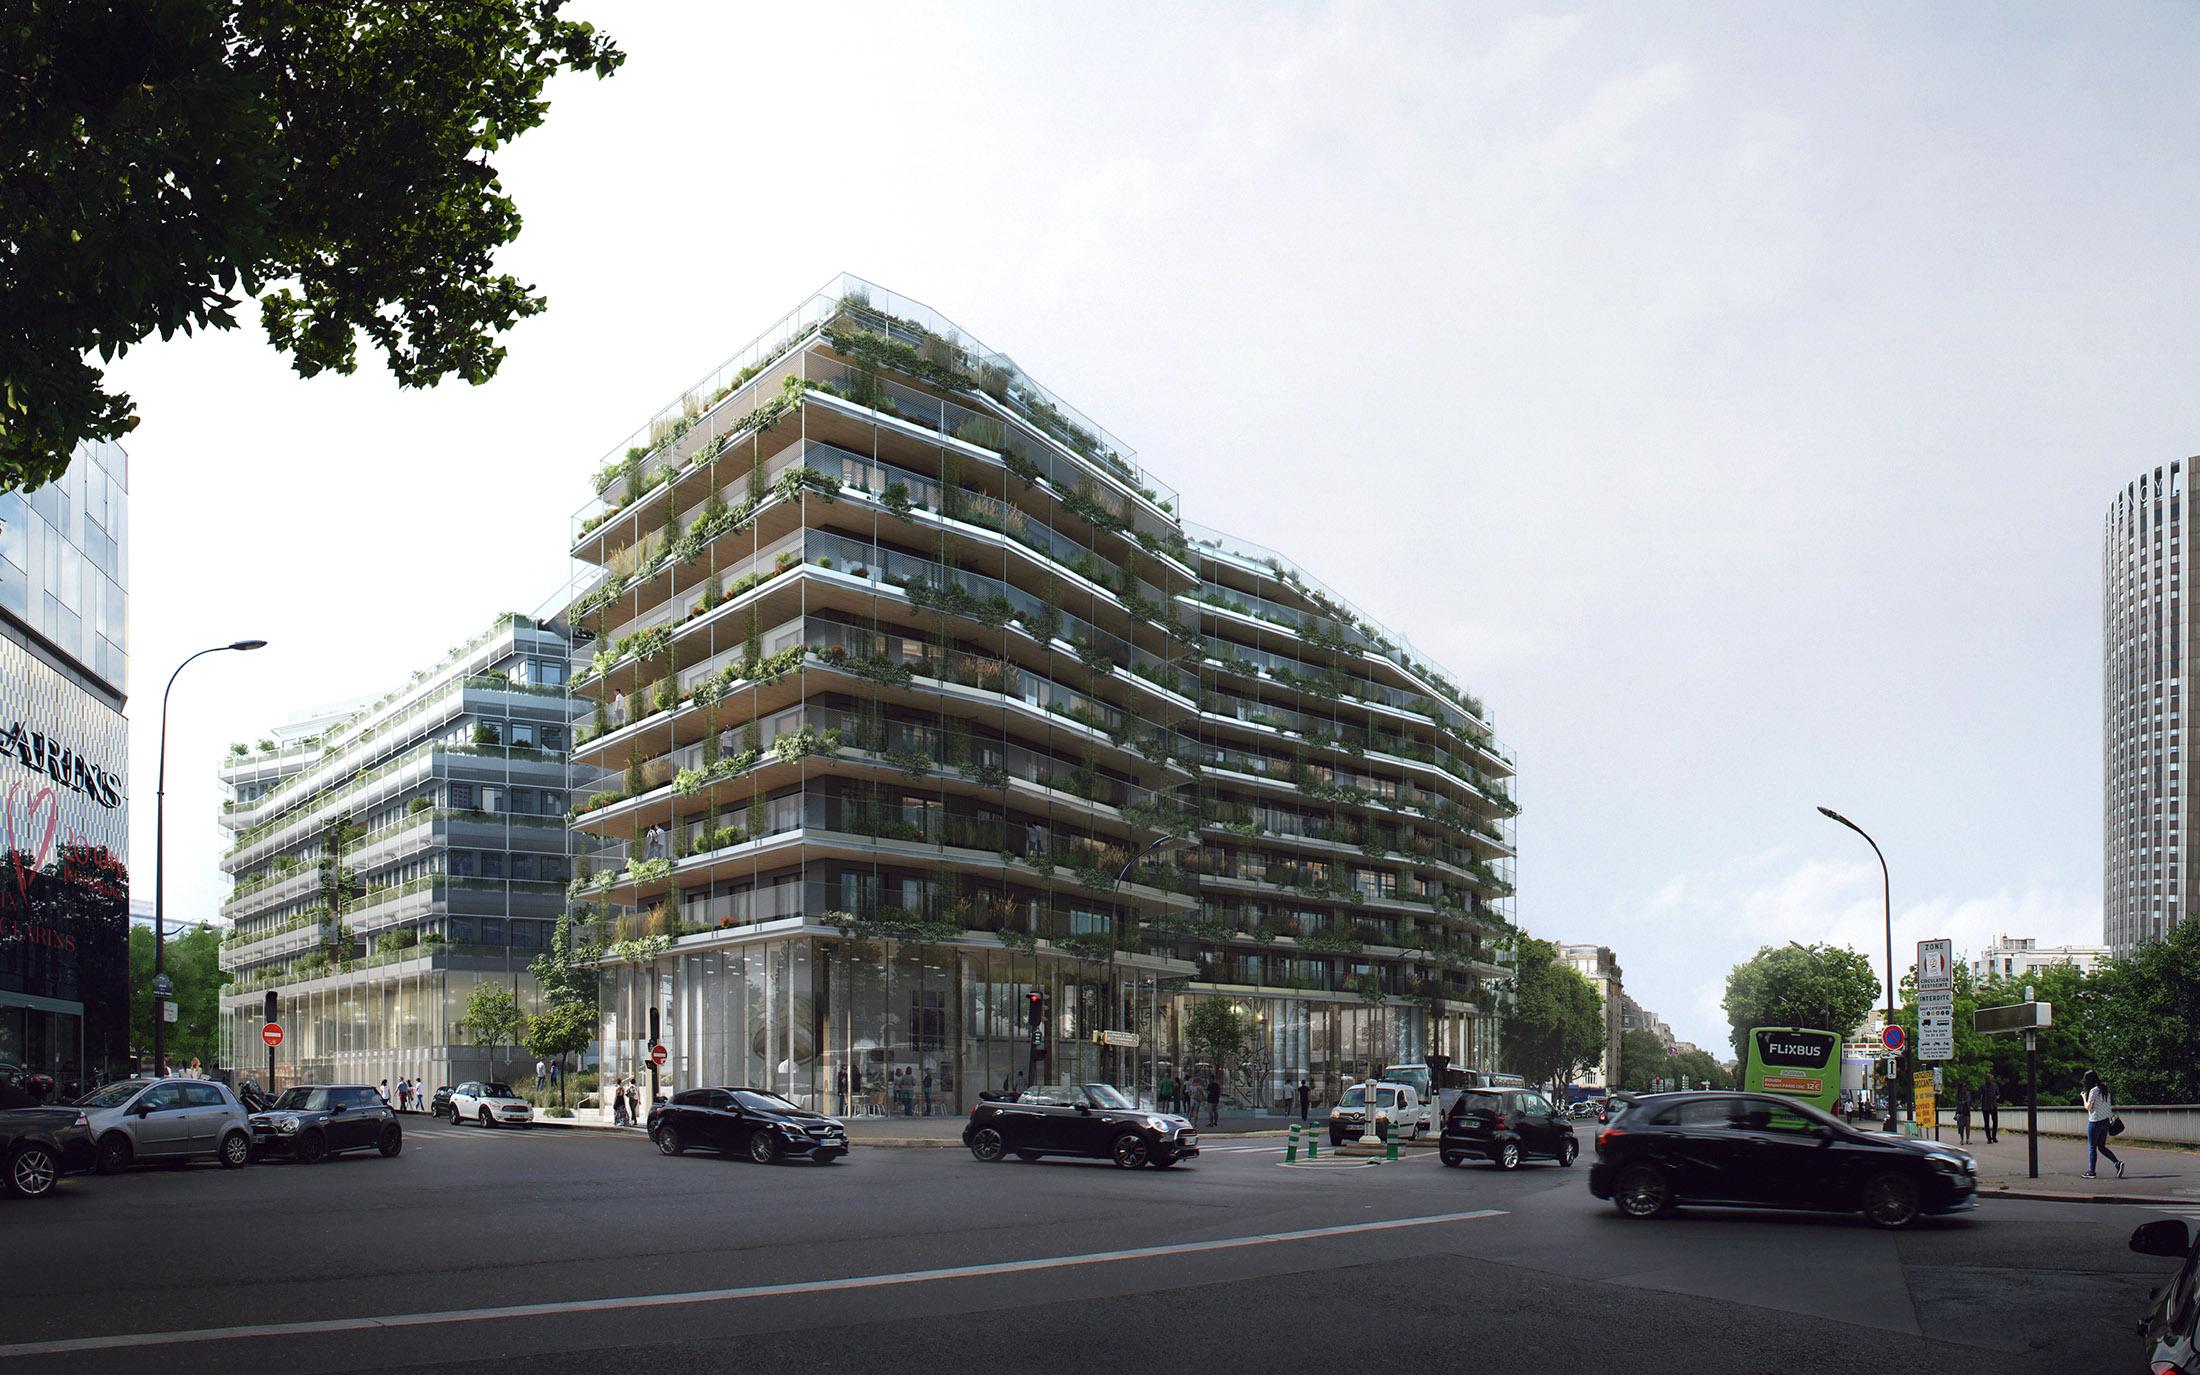 JFA ChD SLA, Reinventer Paris, France, 2017